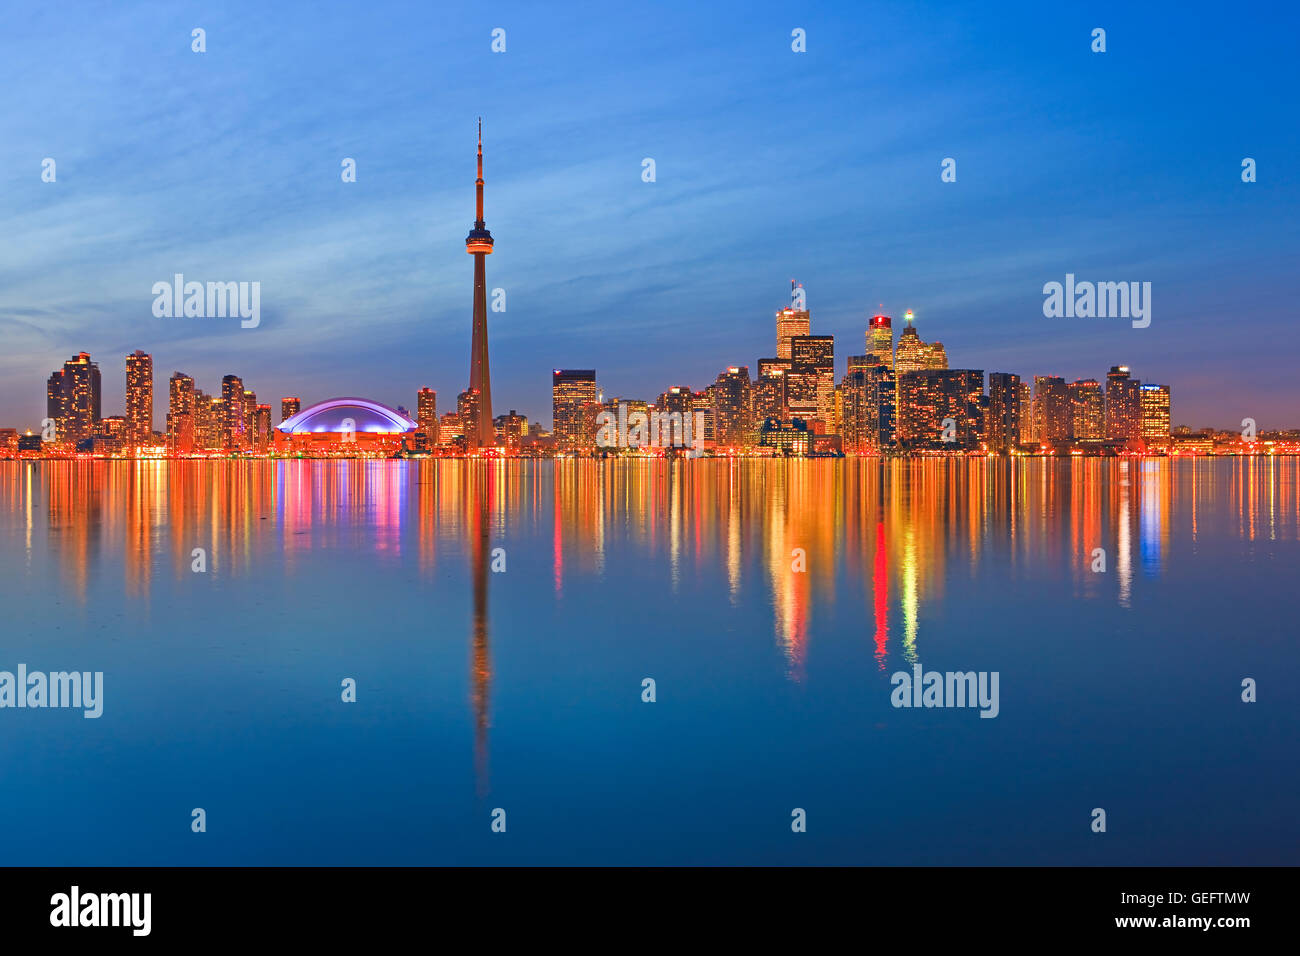 geography,travel,Canada,Ontario,Toronto,Toronto City Skyline seen dusk from Centre Island,Toronto Islands,Lake Ontario,Ontario, Stock Photo